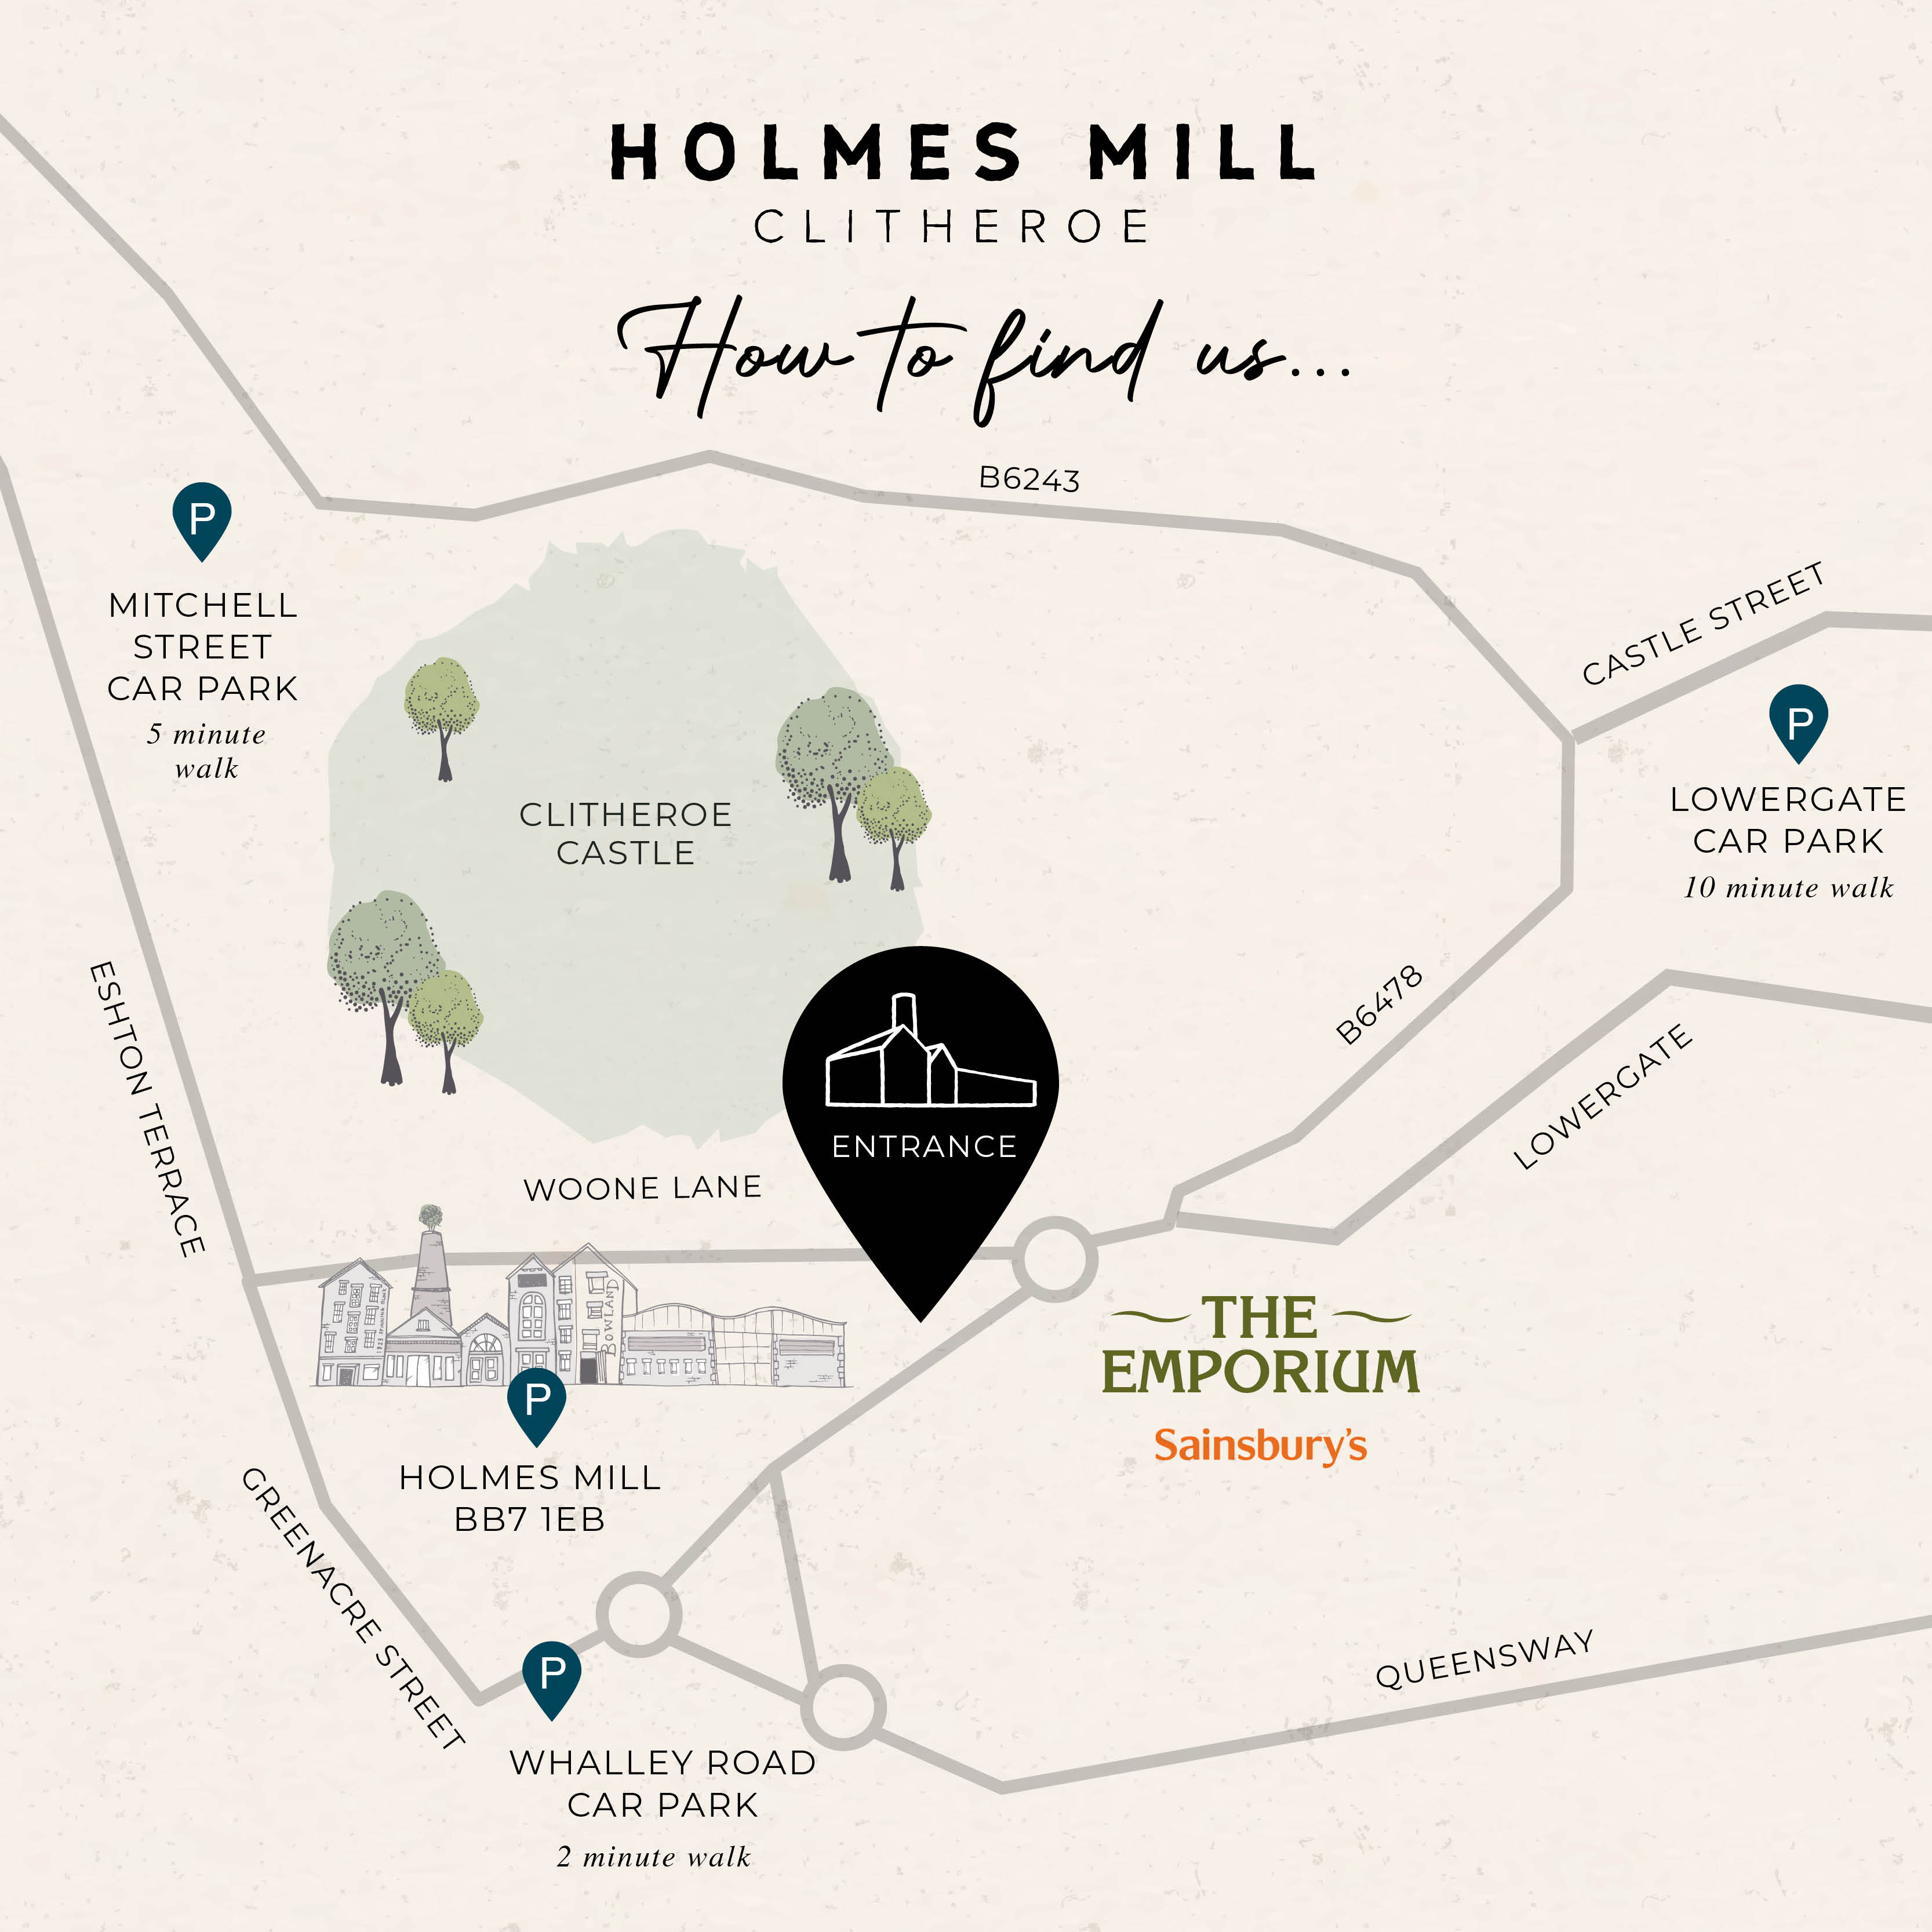 04137 Holmes Mill Parking Map.jpg